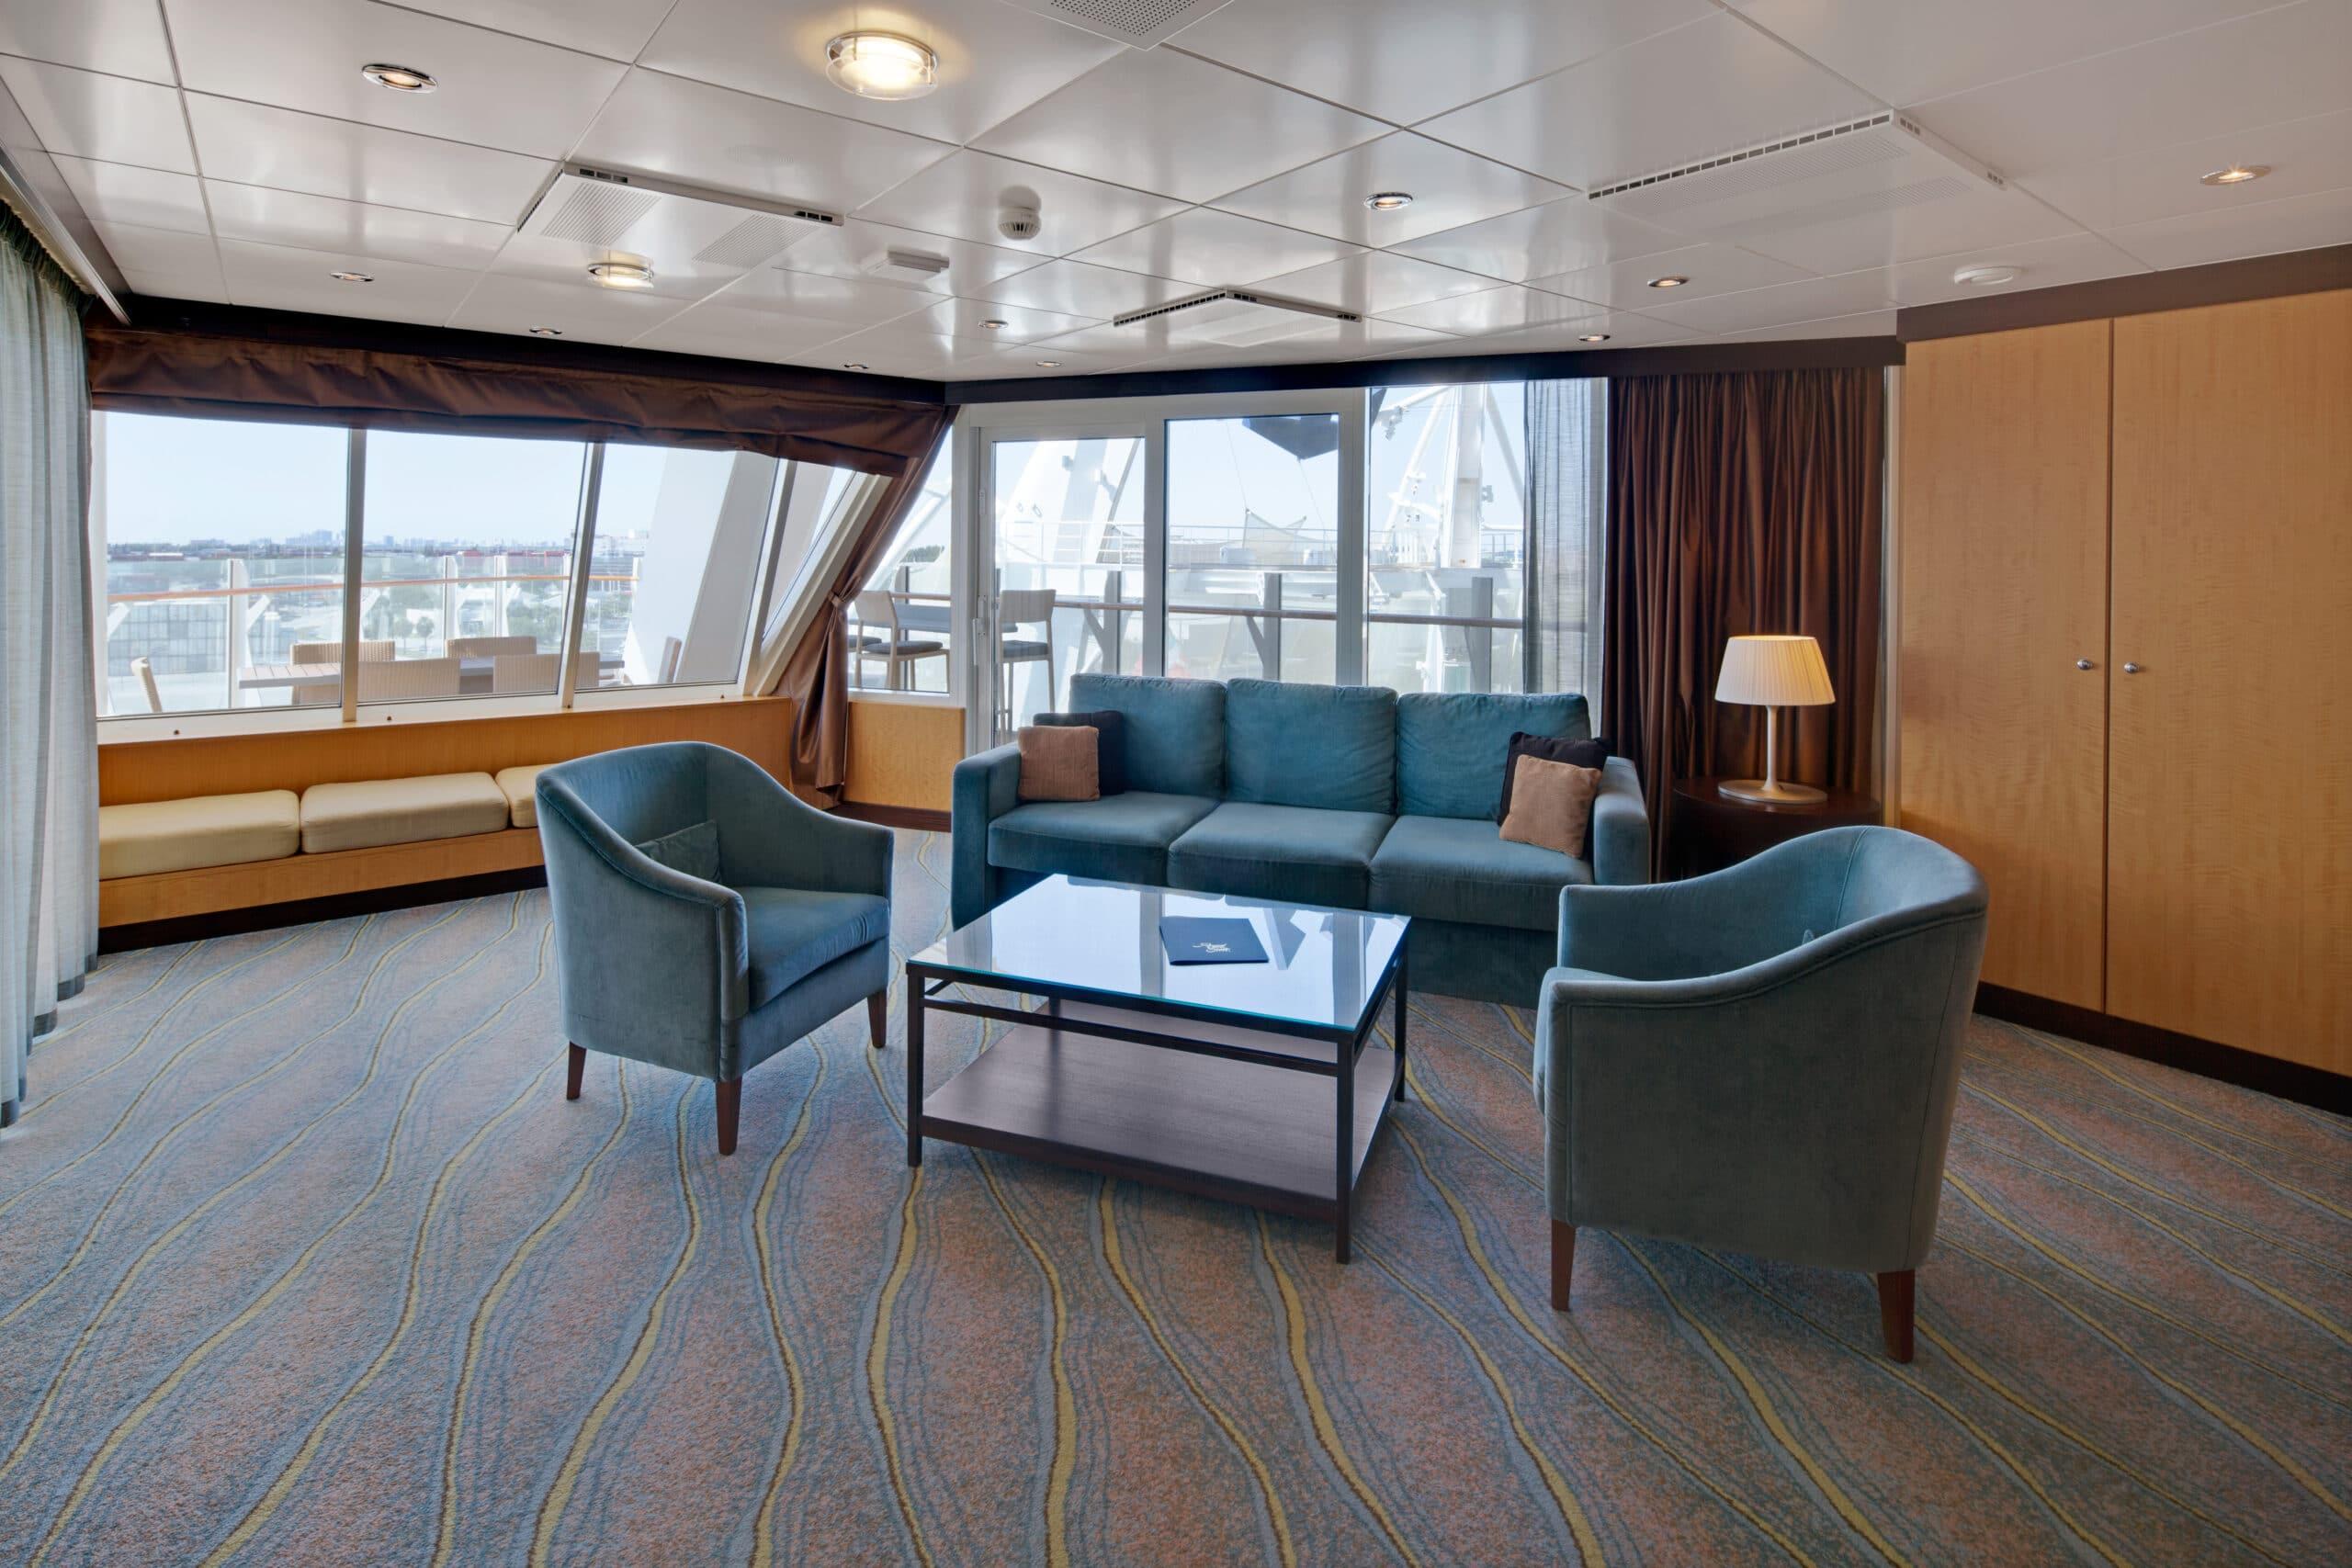 Royal-Caribbean-International-Allure-of-the-Seas-Oasis-of-the-seas-schip-cruiseschip-categorie-A1-Ruime-Aqua-theather-met-2-slaapkamers